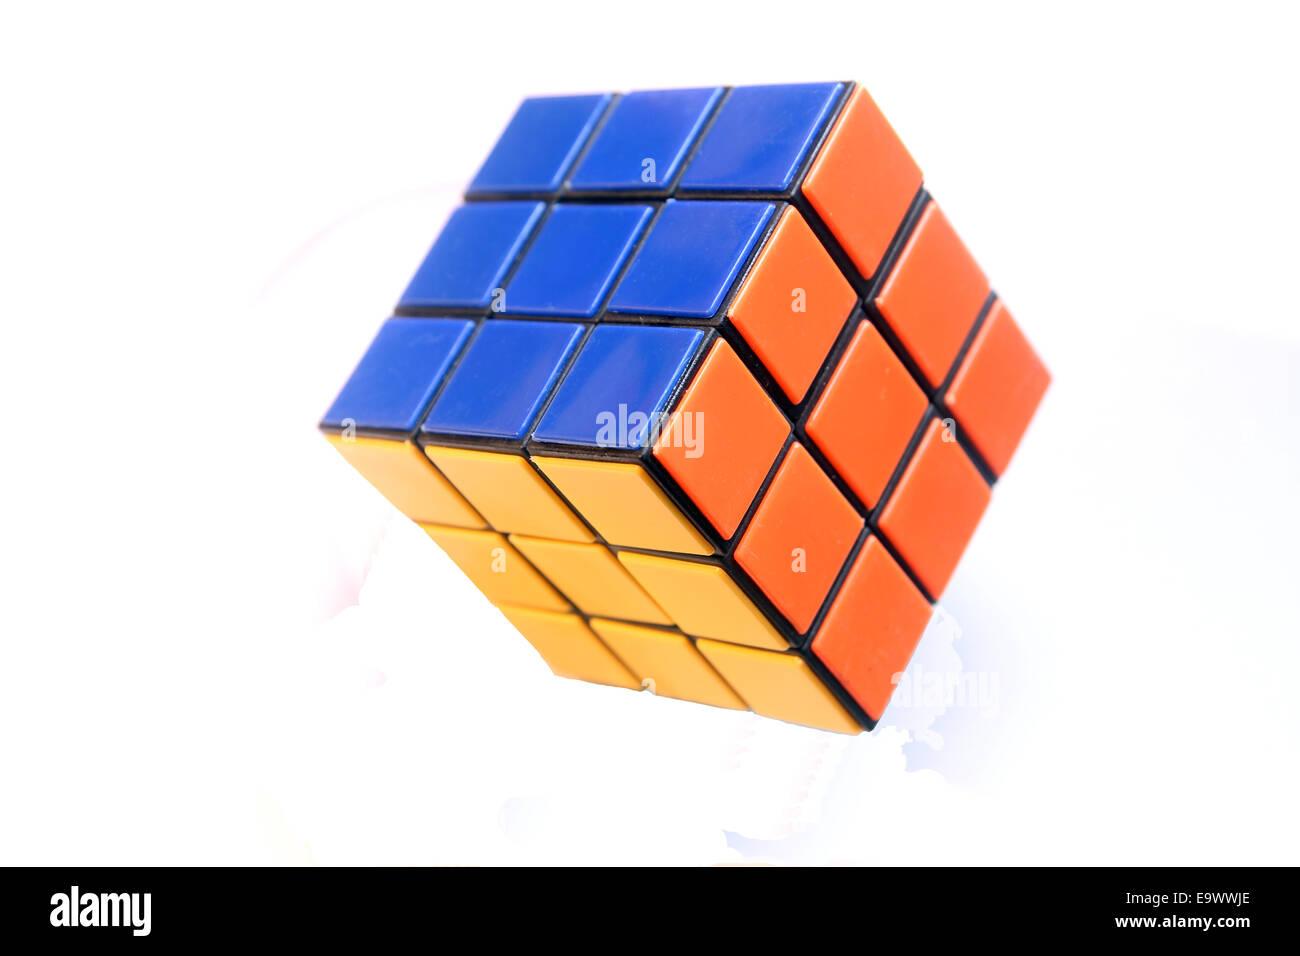 still life of rubik cube - Stock Image